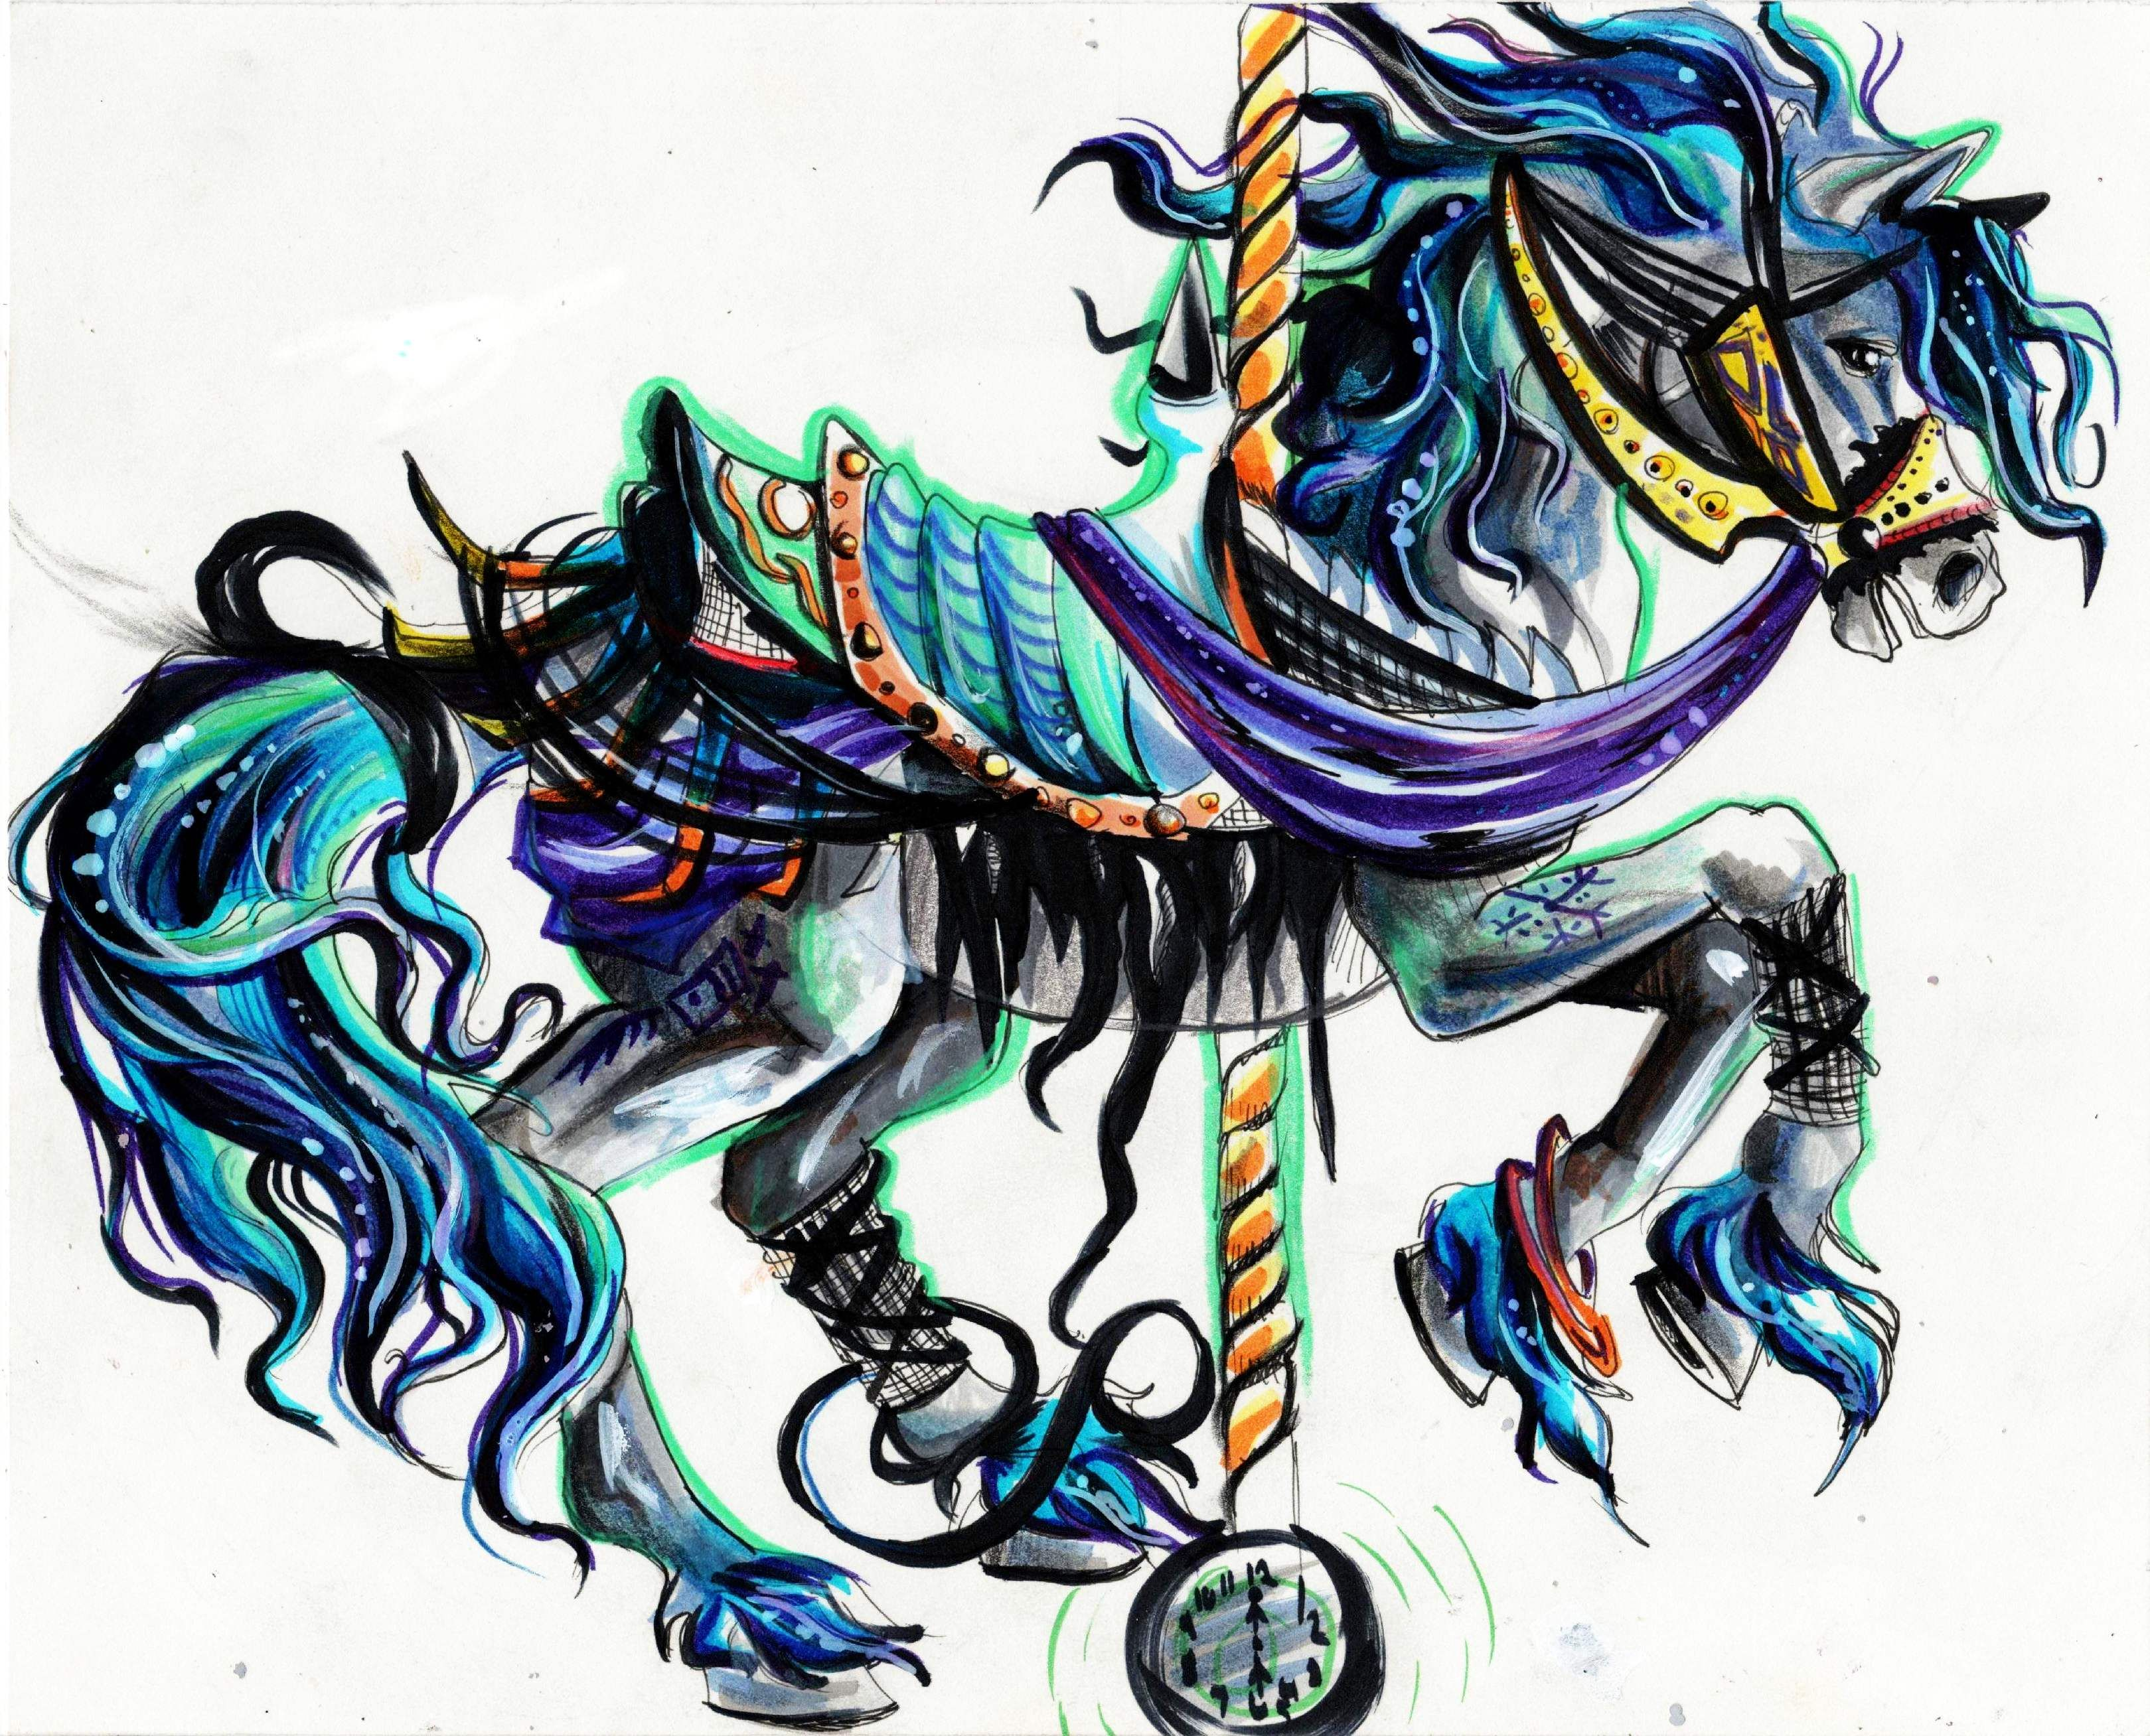 Carousel Horse Carousel Horse Tattoos Horse Tattoo Carosel Horse